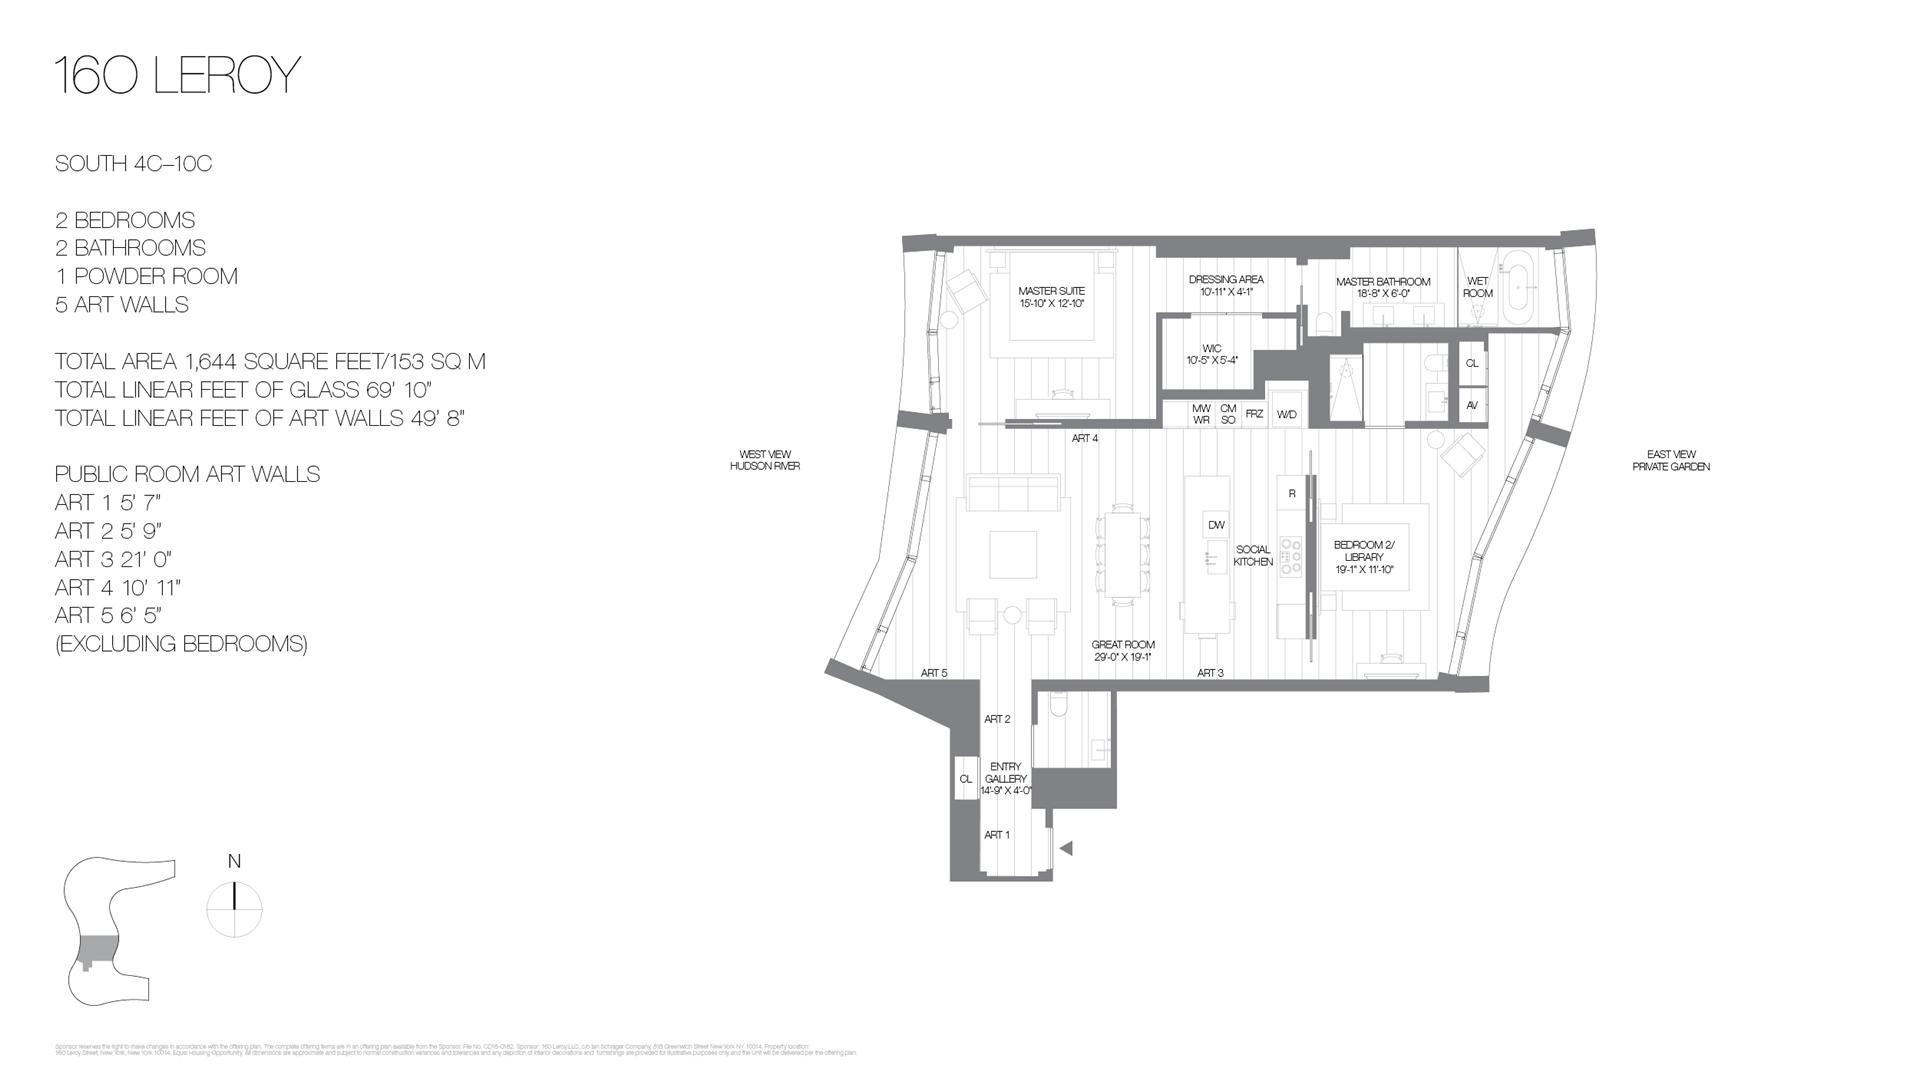 Floor plan of 160 Leroy Street, SOUTH4C - West Village - Meatpacking District, New York